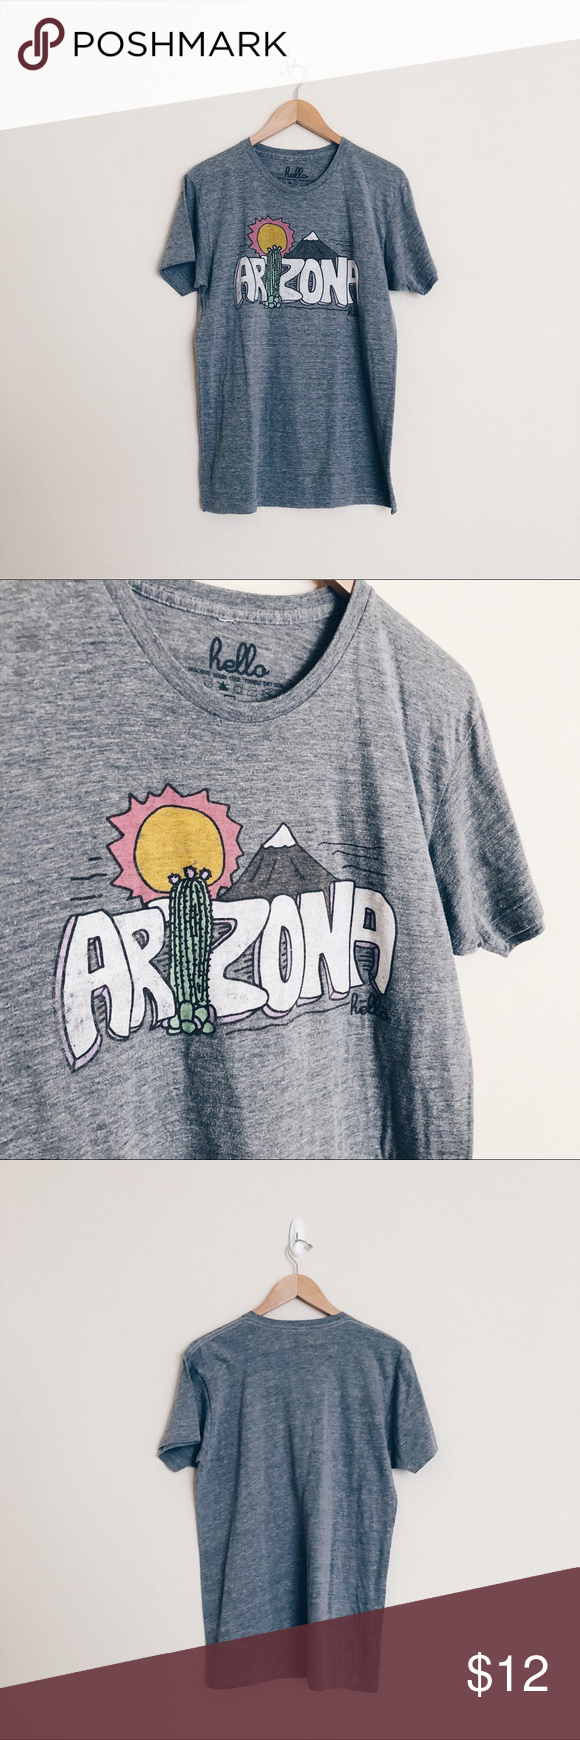 Hello Apparel • Arizona Cactus Short Sleeve Shirt Good Pre-Owned Condition. Hello Apparel Tops Tees - Short Sleeve #arizonacactus Hello Apparel • Arizona Cactus Short Sleeve Shirt Good Pre-Owned Condition. Hello Apparel Tops Tees - Short Sleeve #arizonacactus